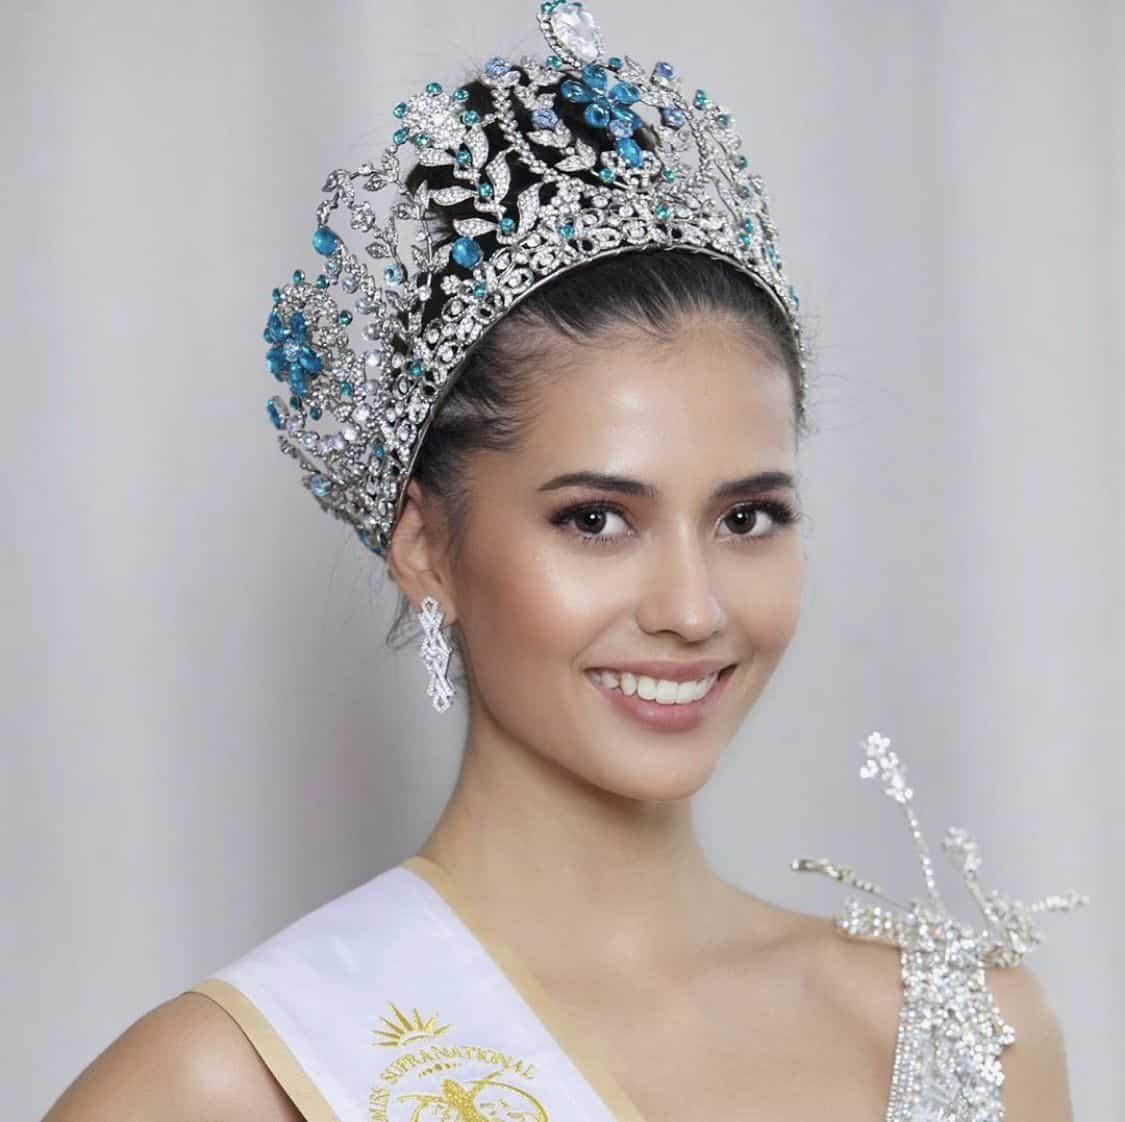 Miss Supranational Thailand. bconceptgroup.com